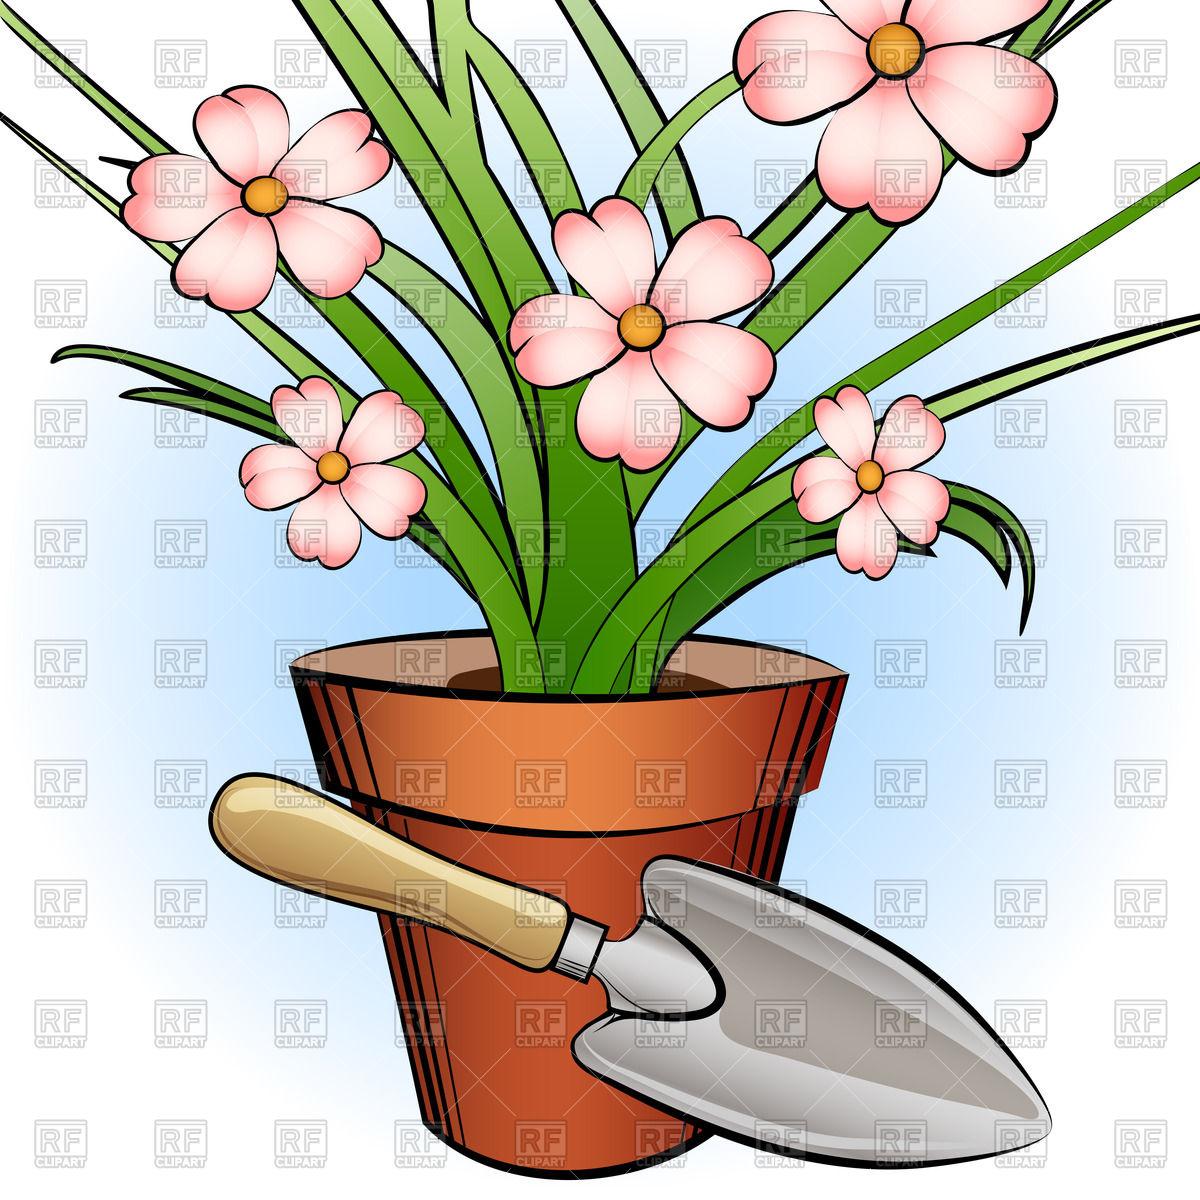 Window plant and garden shovel Vector Image #44204.